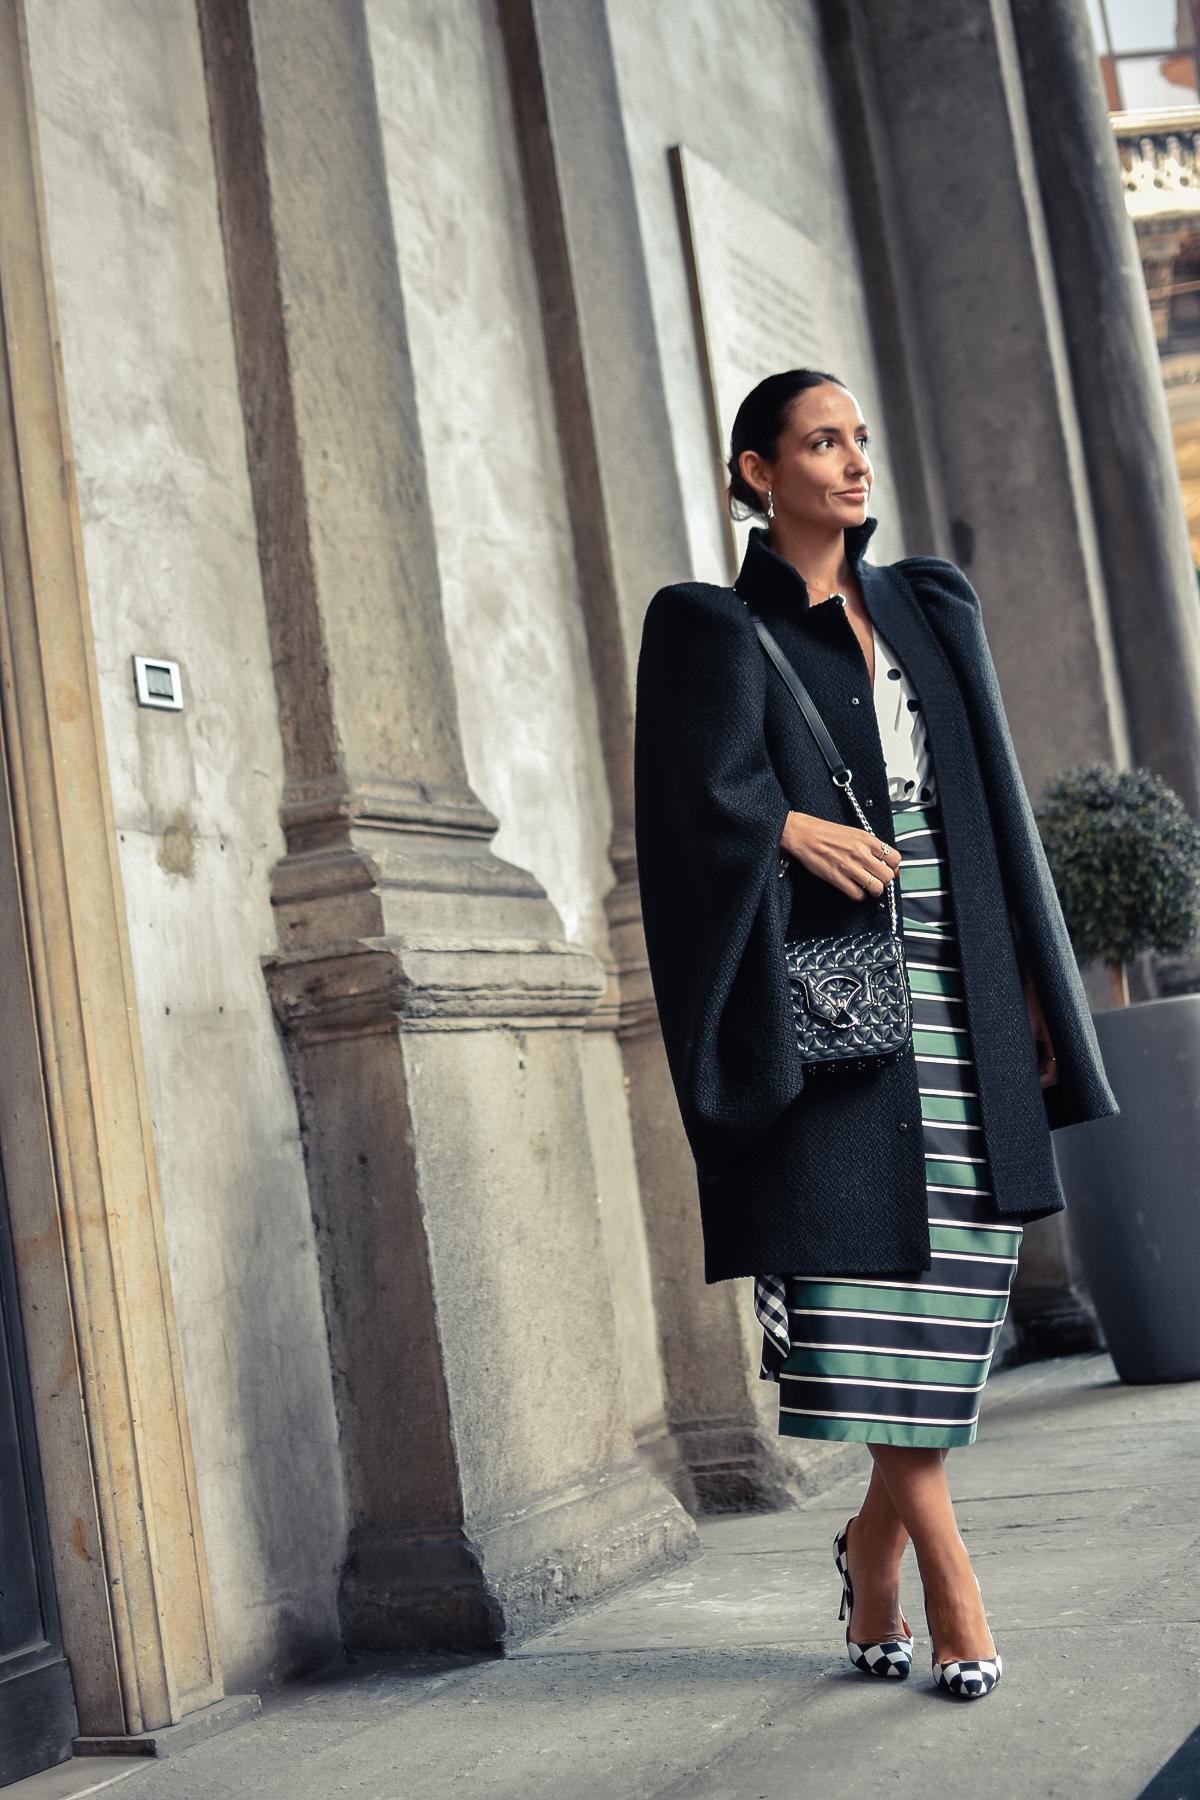 el-blog-de-silvia-mfw-milan-fashion-week-street-style-falda-rayas-manolo-blahnik-04